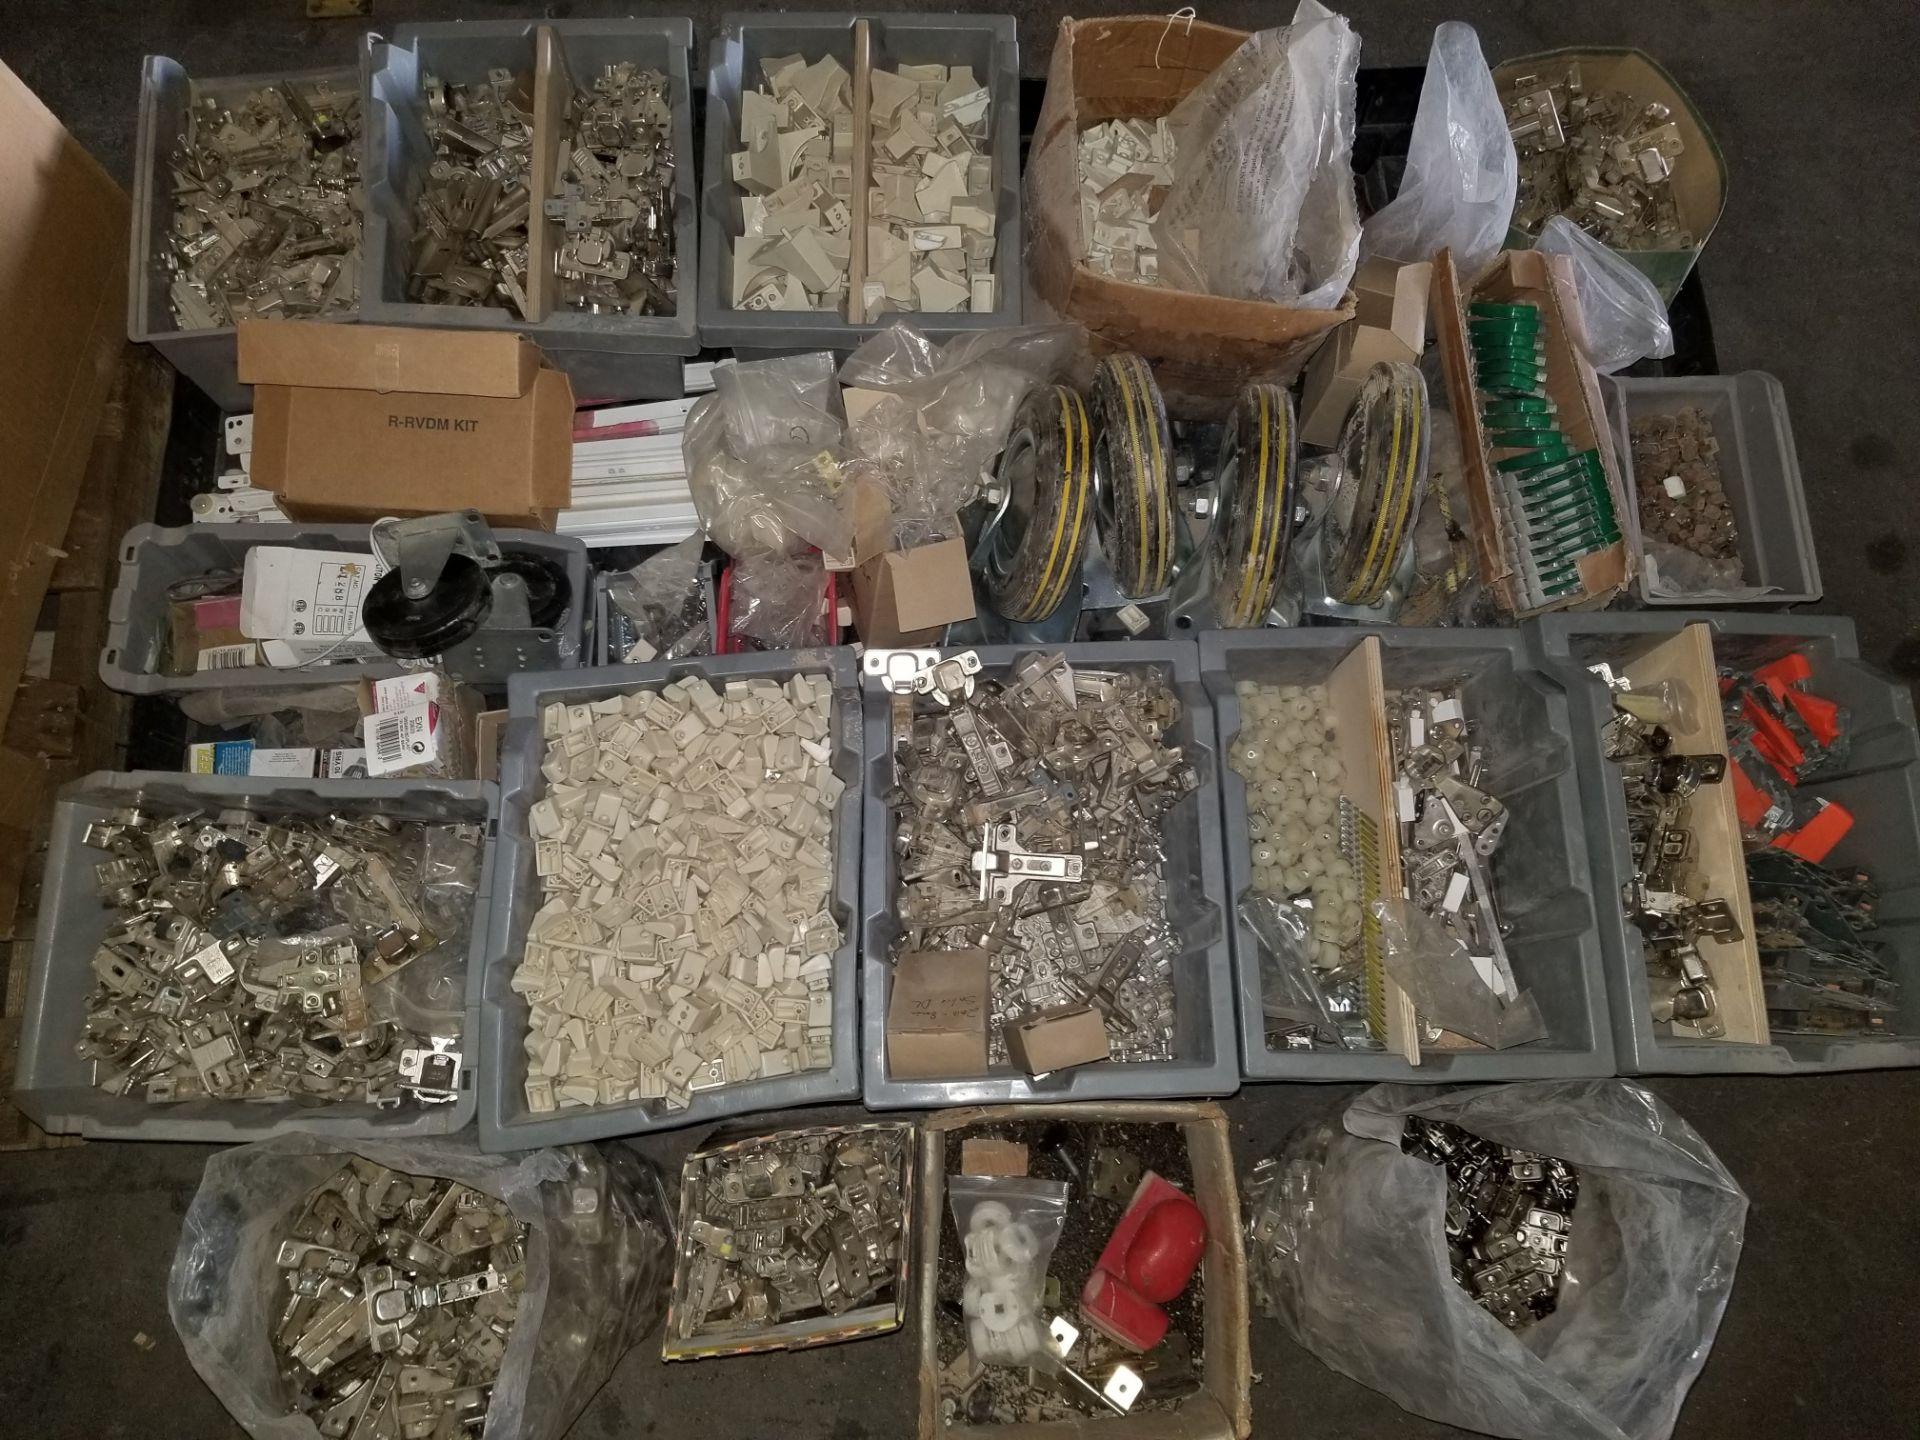 Lot 42 - Pallet of Misc. Hardware, Hinges, Screws, Spacers, caster wheels, & More